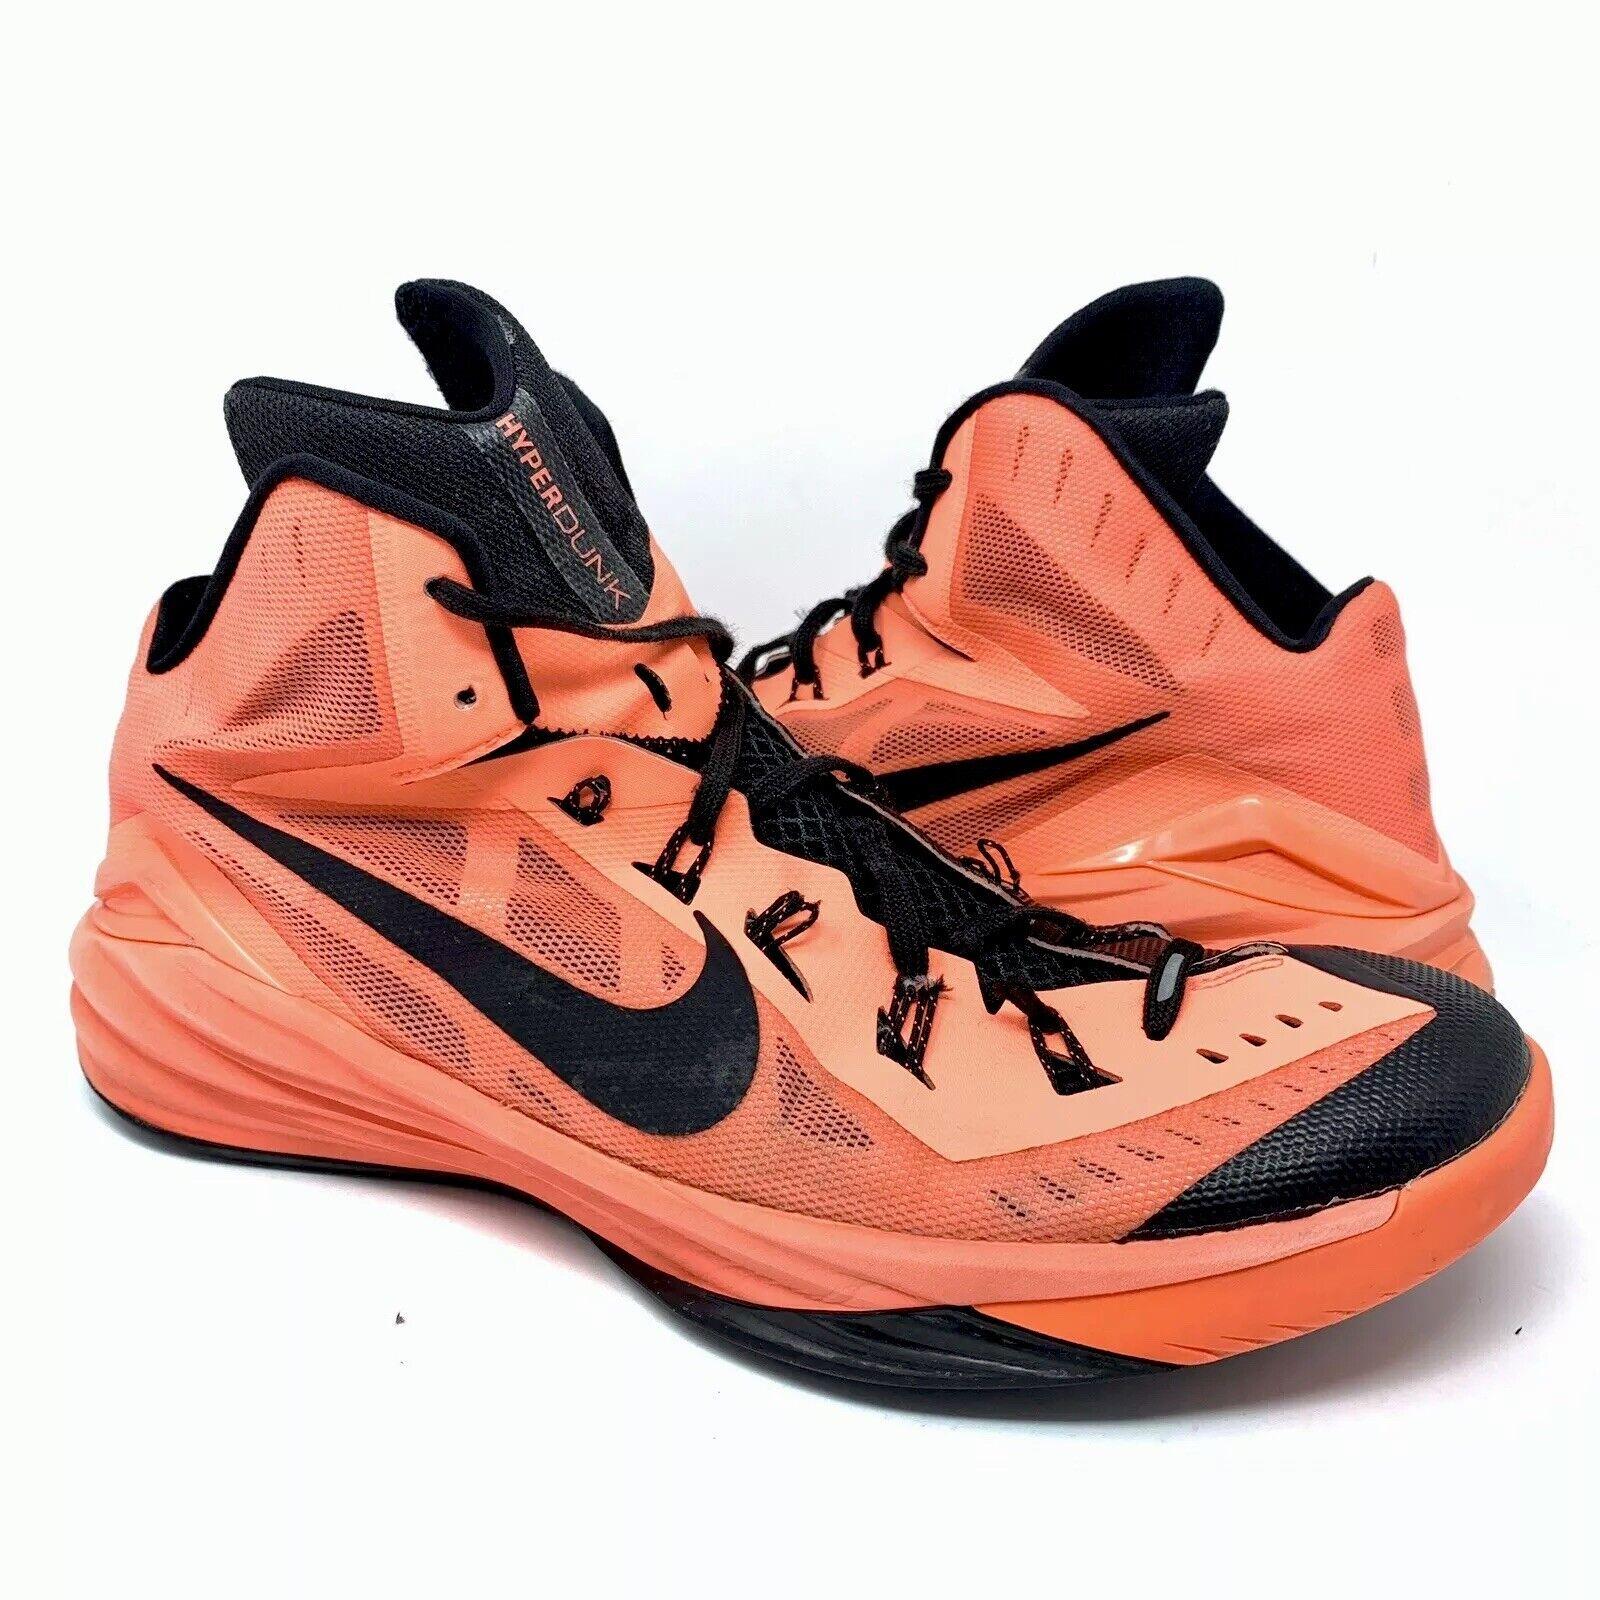 NIKE HYPERDUNK 2014 Men's Basketball shoes 853840-800 Bright Mango Black Sz 15